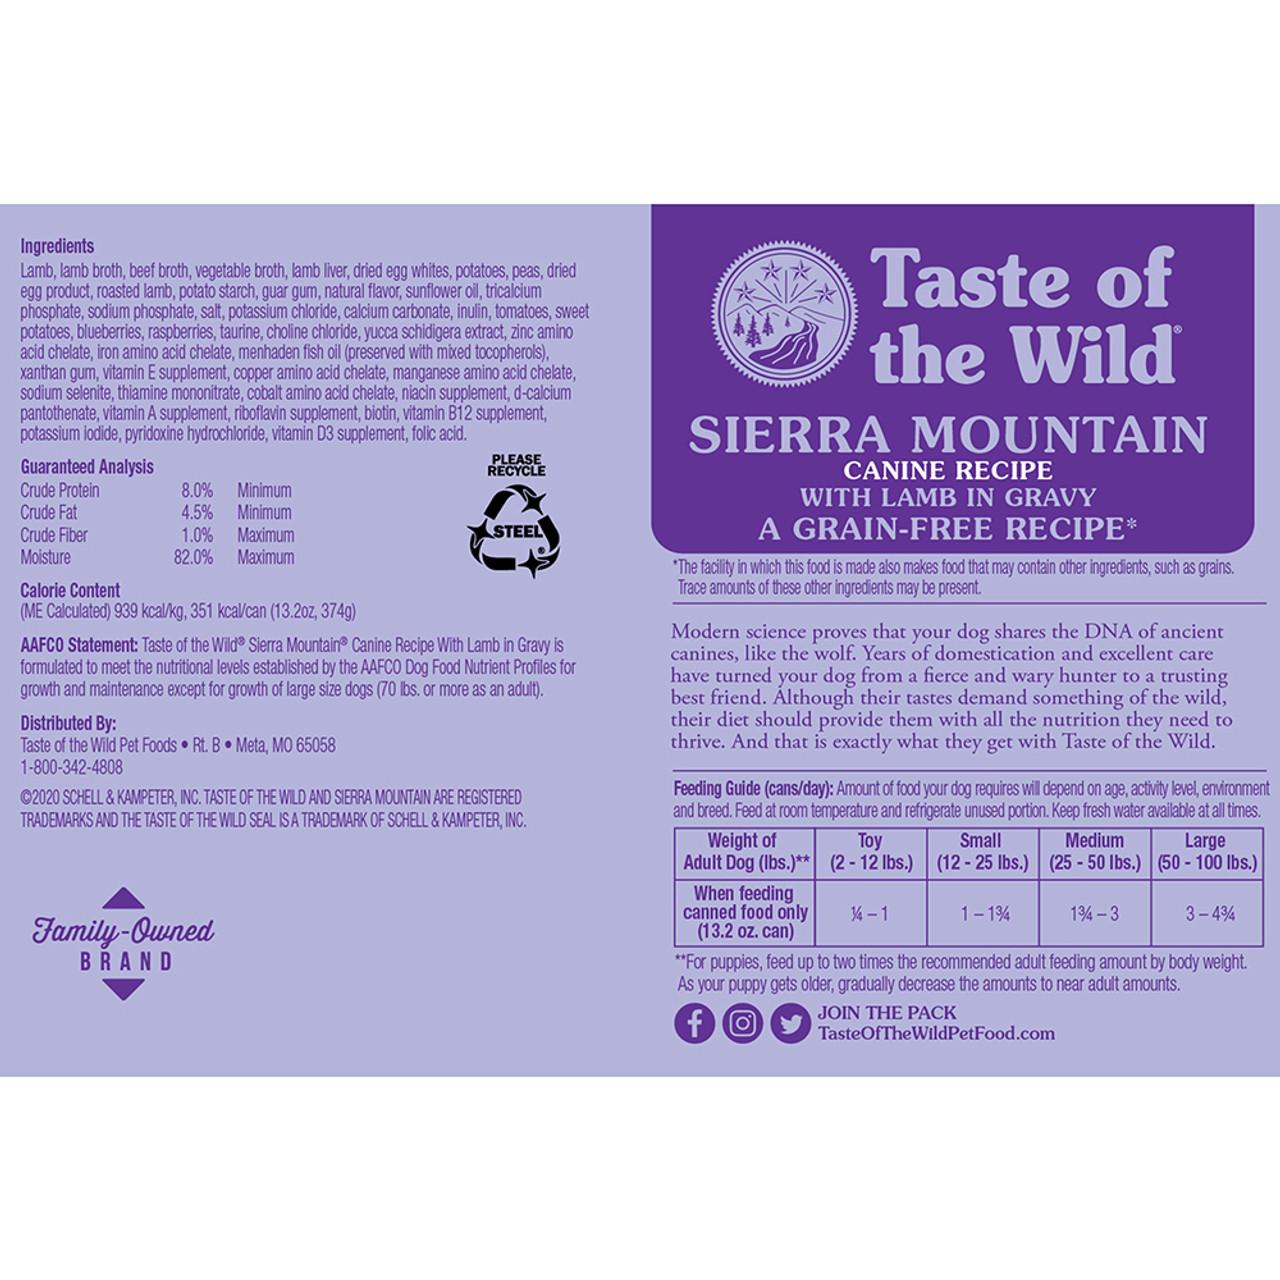 Taste of the Wild Sierra Mountain Canine Formula Canned Dog Food - Back